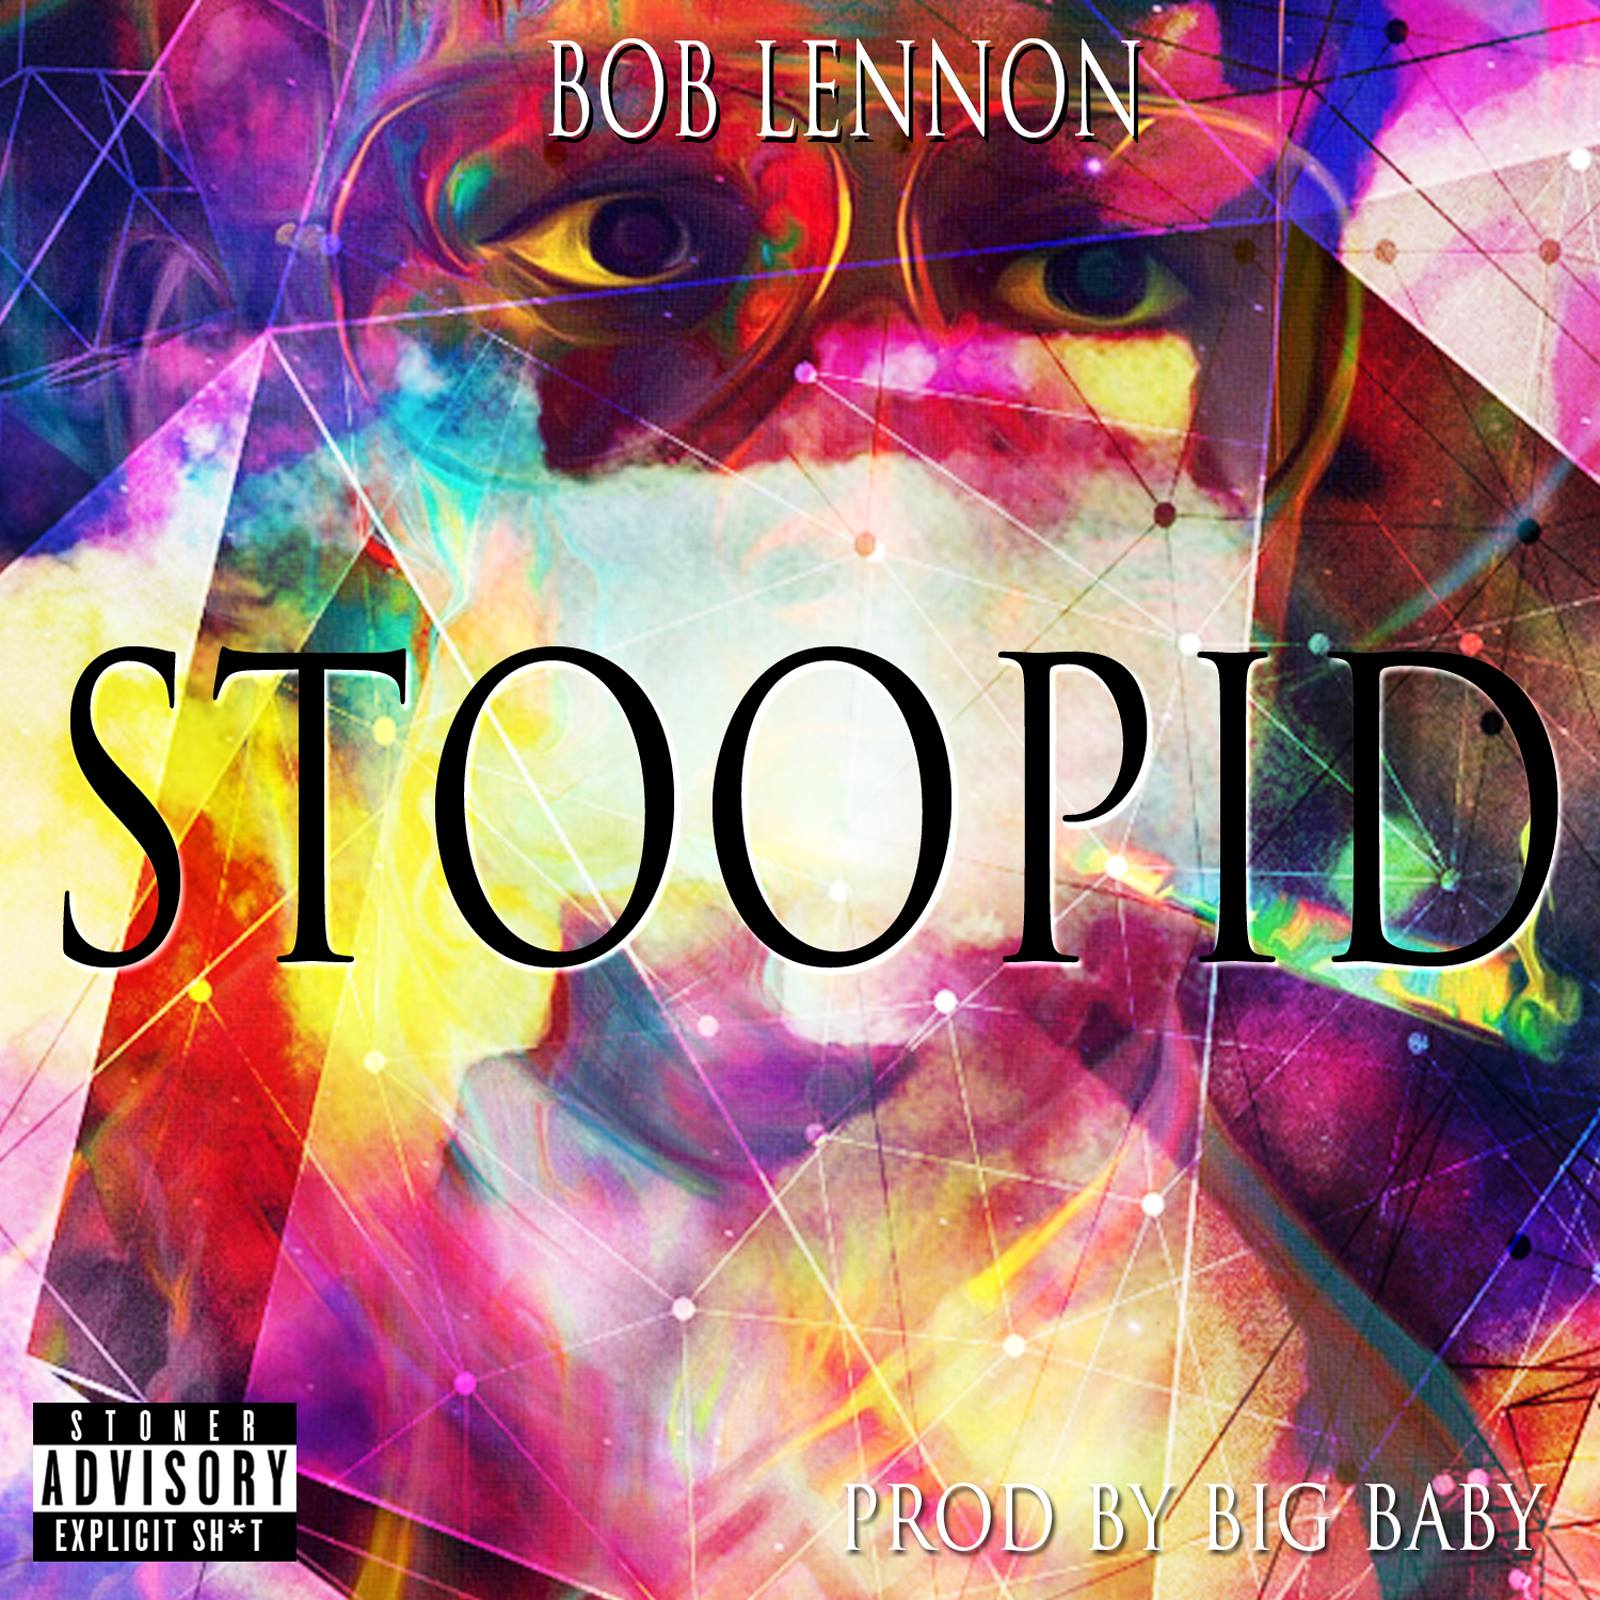 Bob Lennon Stoopid produced-Big Baby